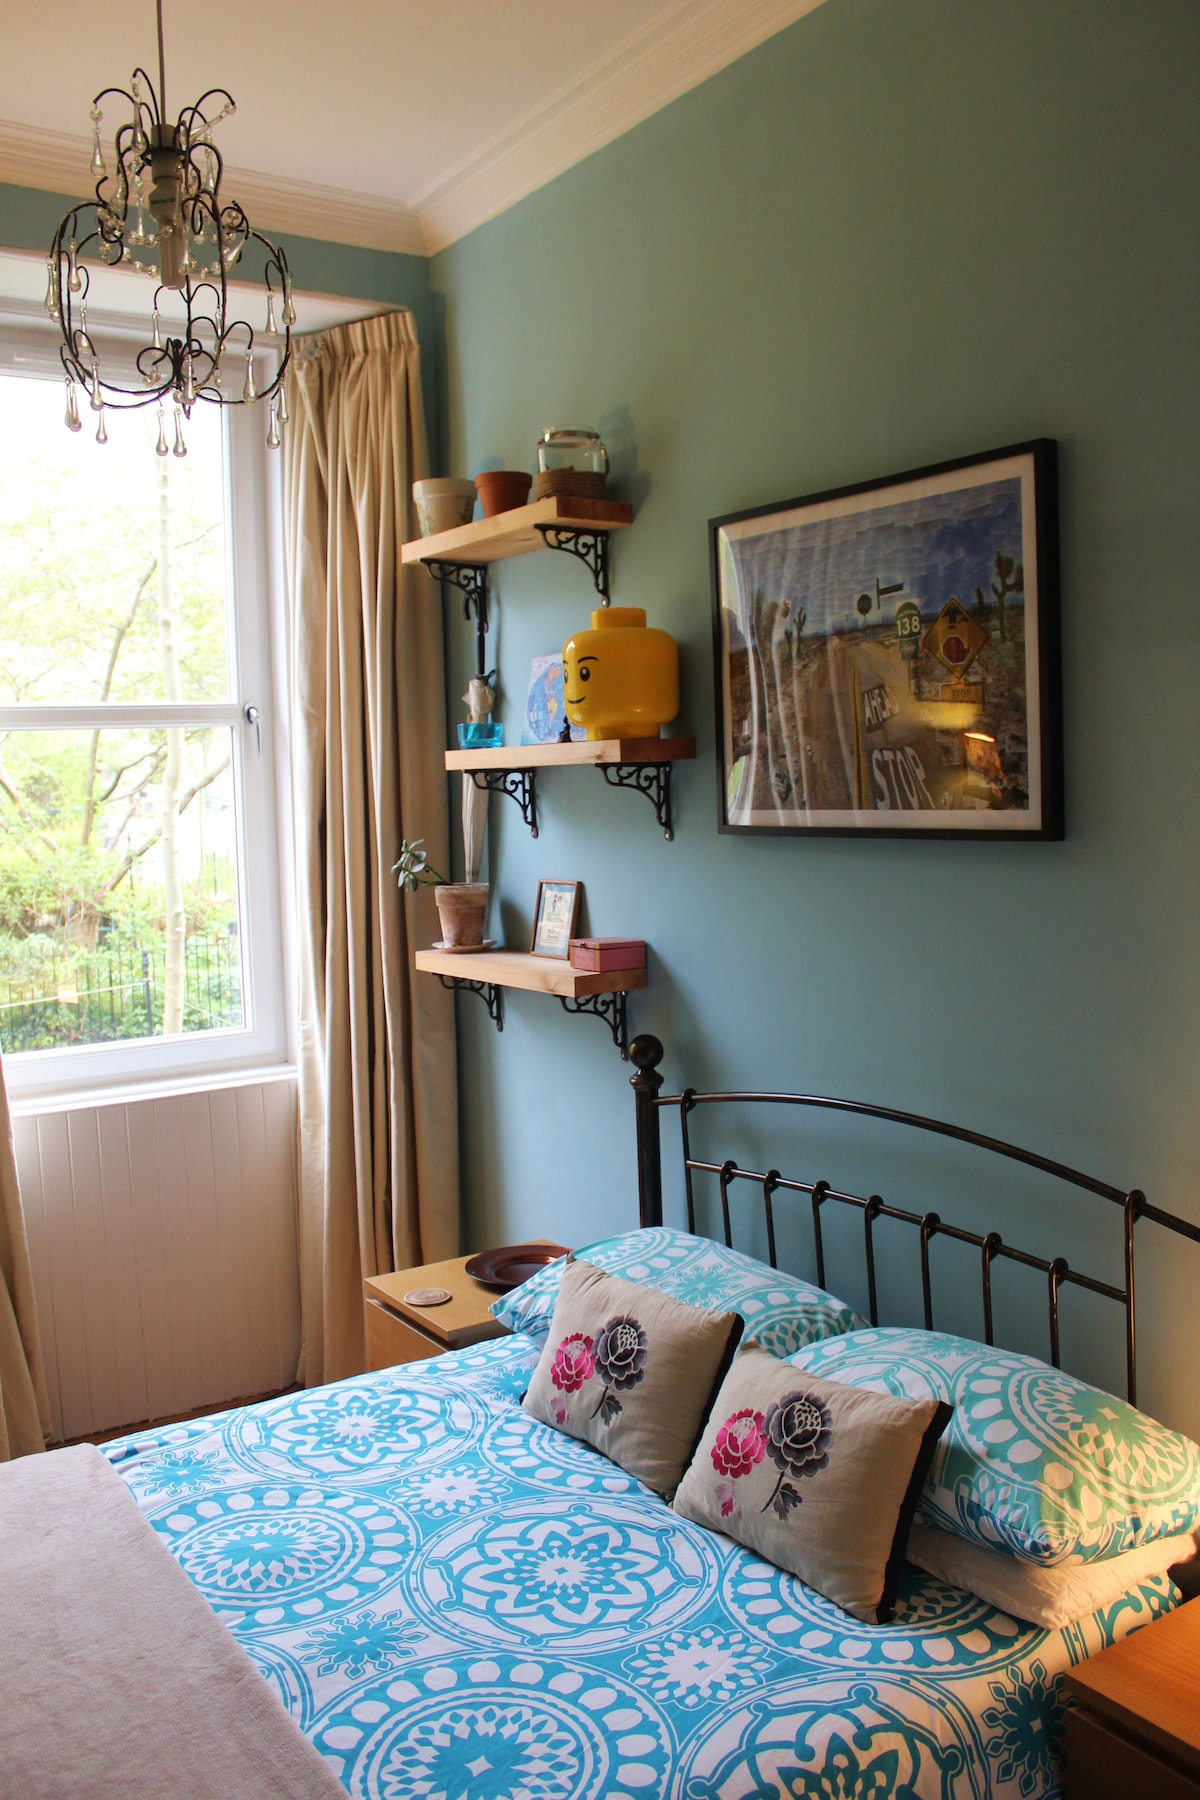 Entire flat for rent In Edinburgh